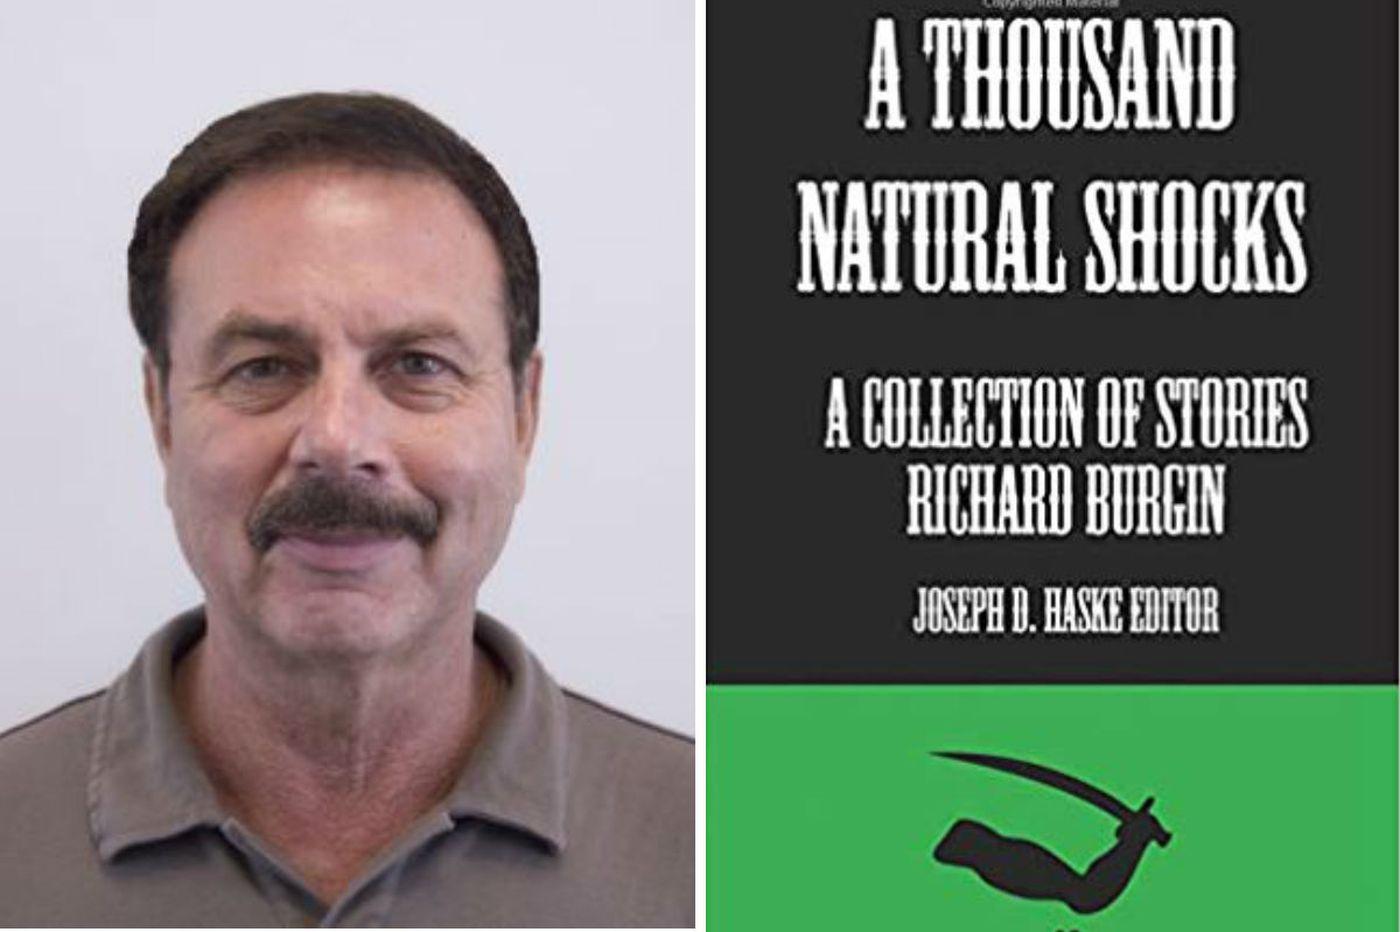 Richard Burgin's 'A Thousand Natural Shocks': Imaginative, profound, with dark humor added